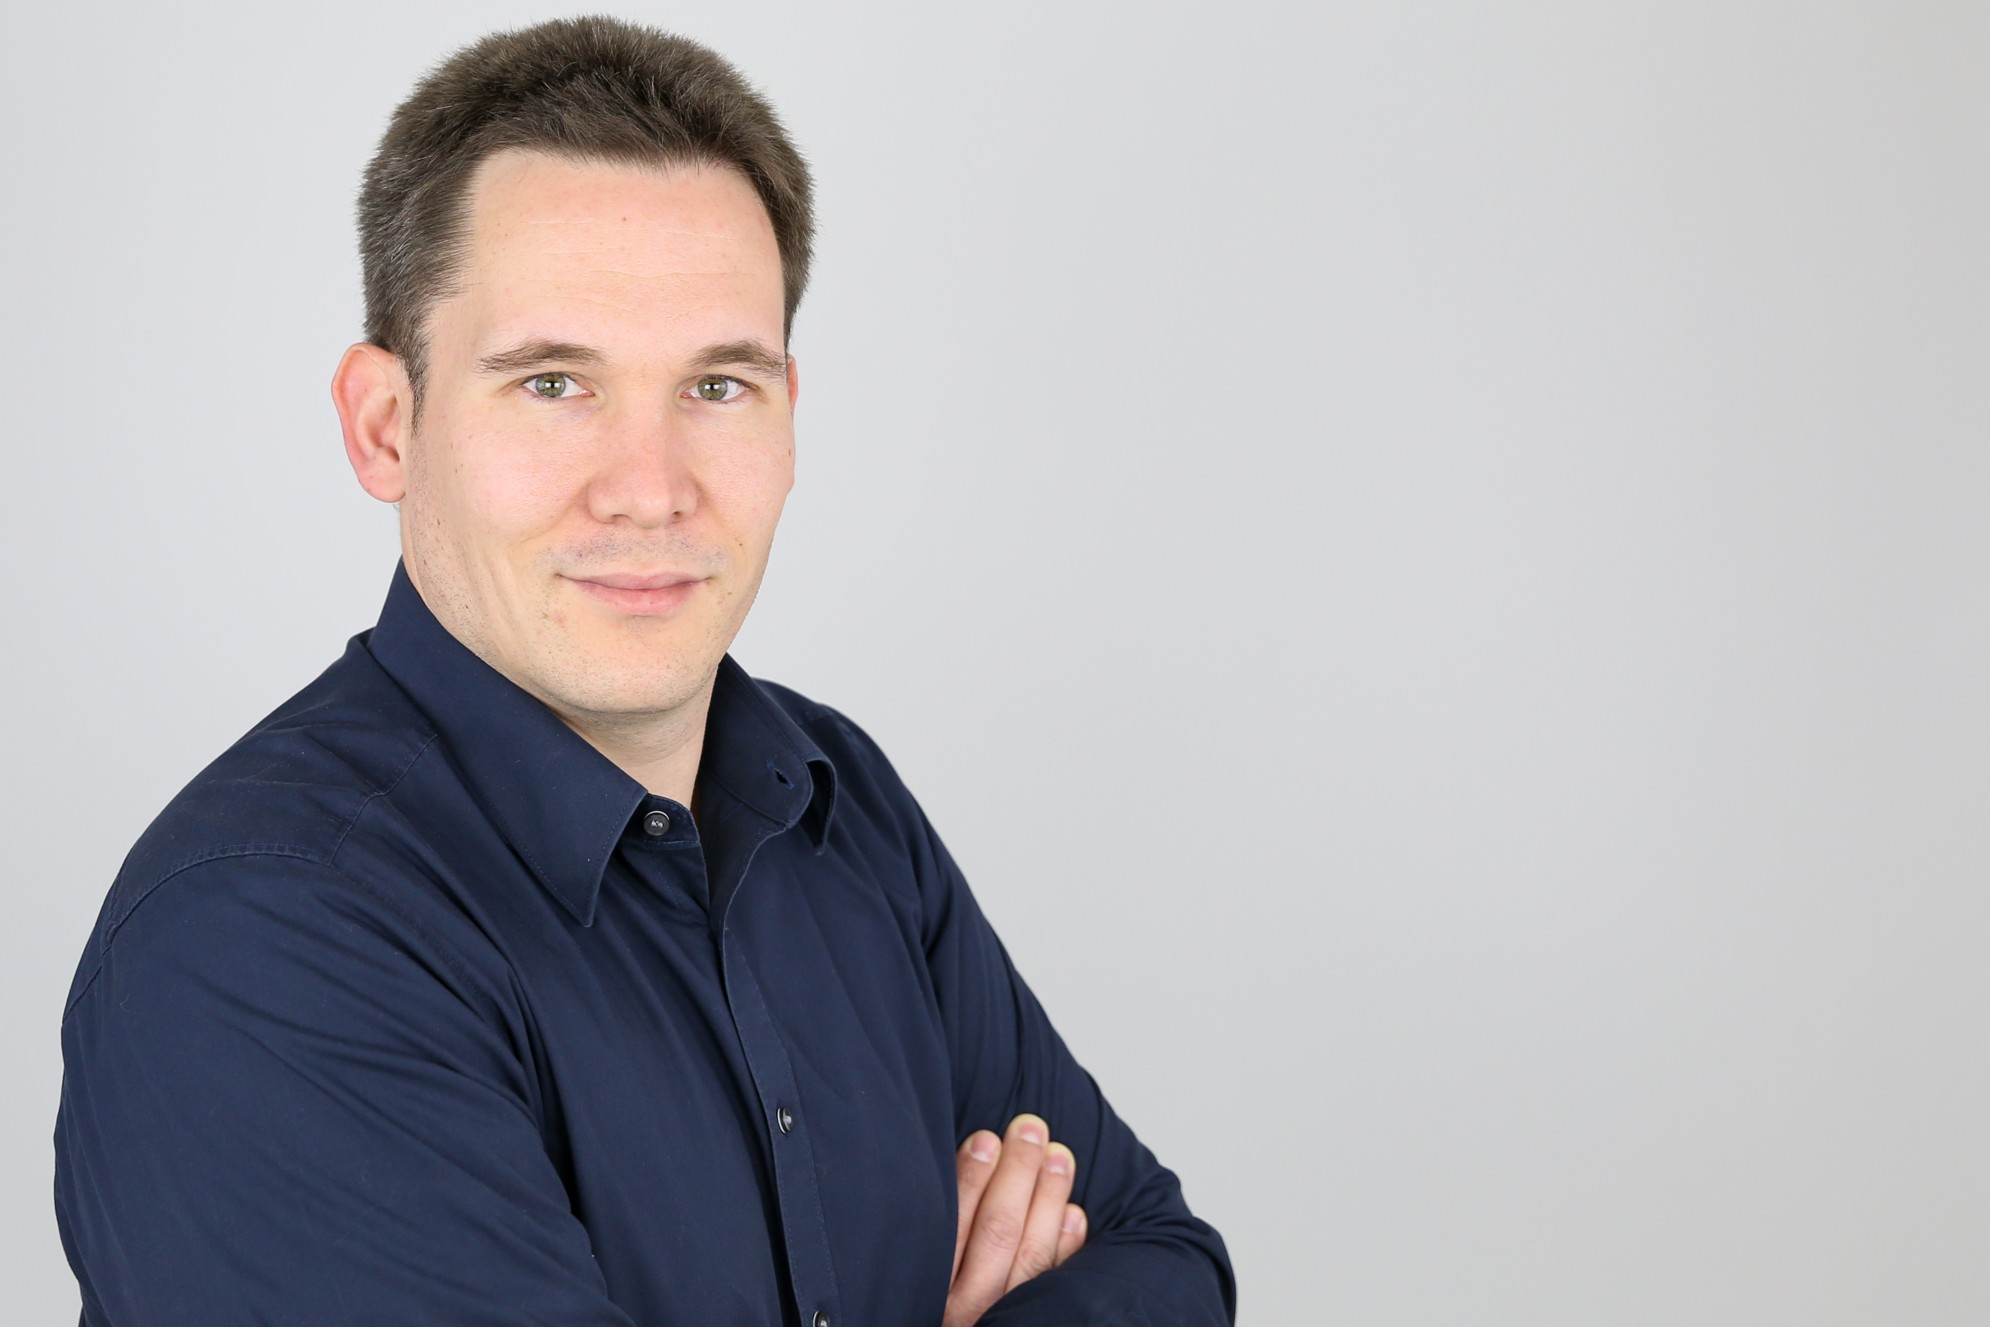 Mut in der Unternehmensnachfolge, Jan Hoßfeld